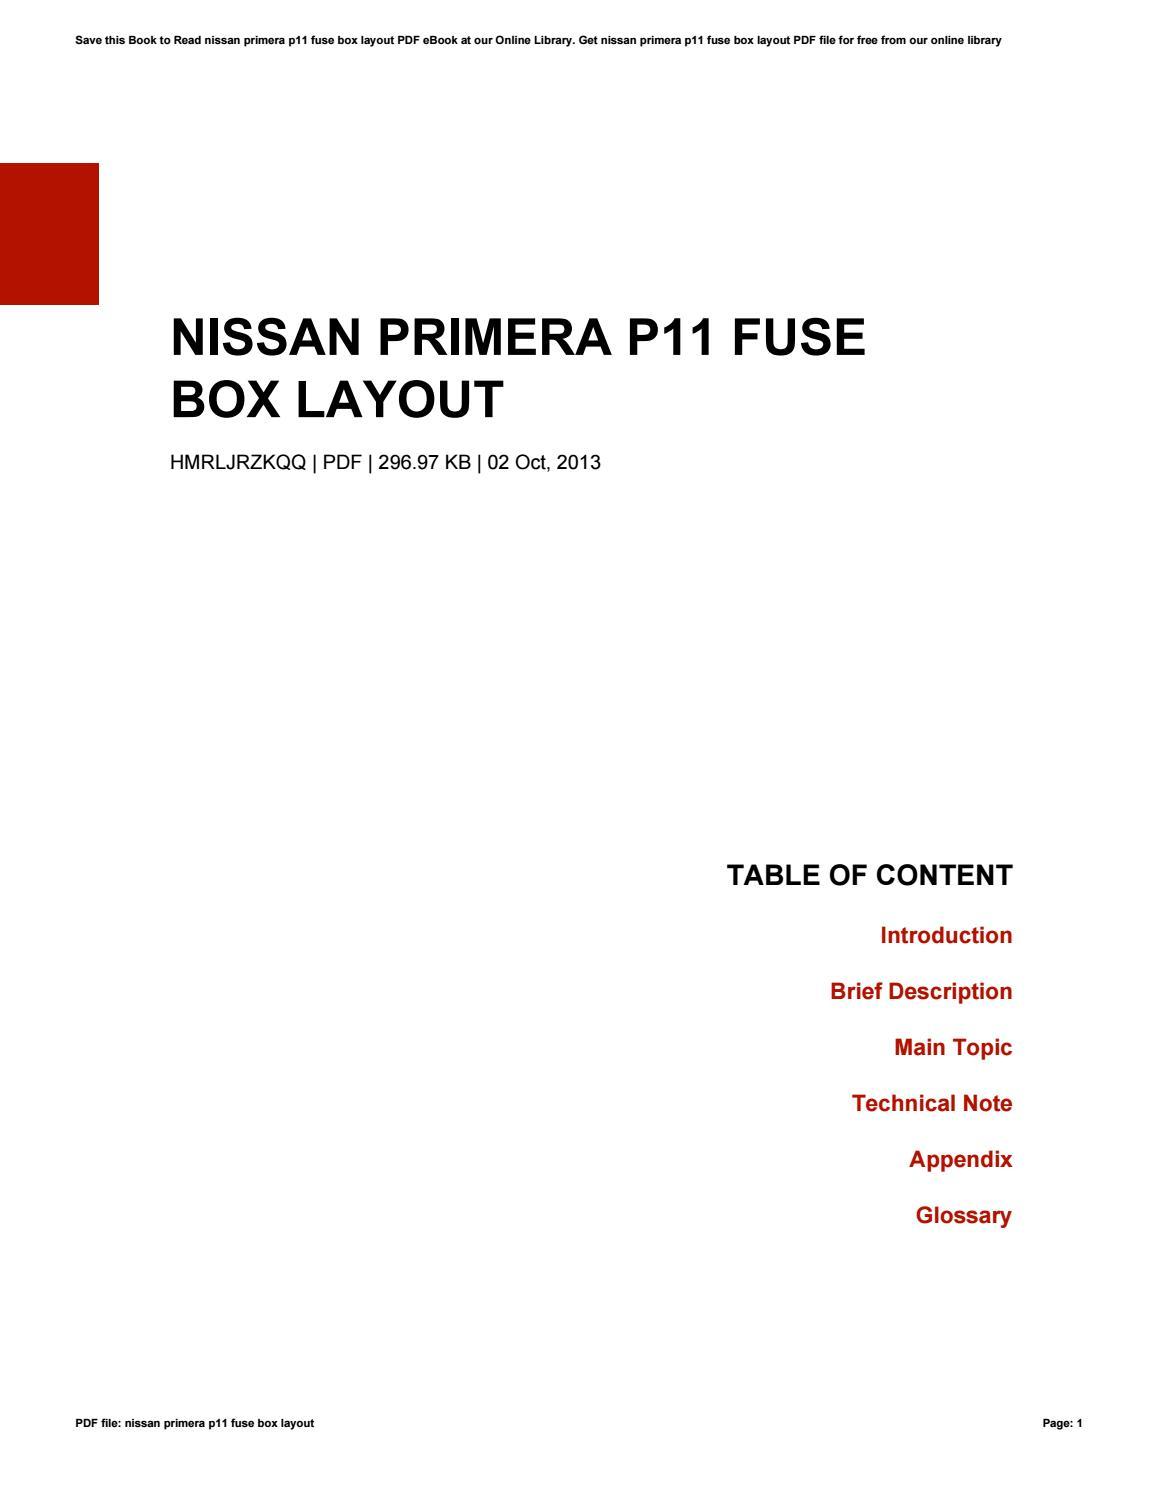 nissan primera p11 fuse box layout